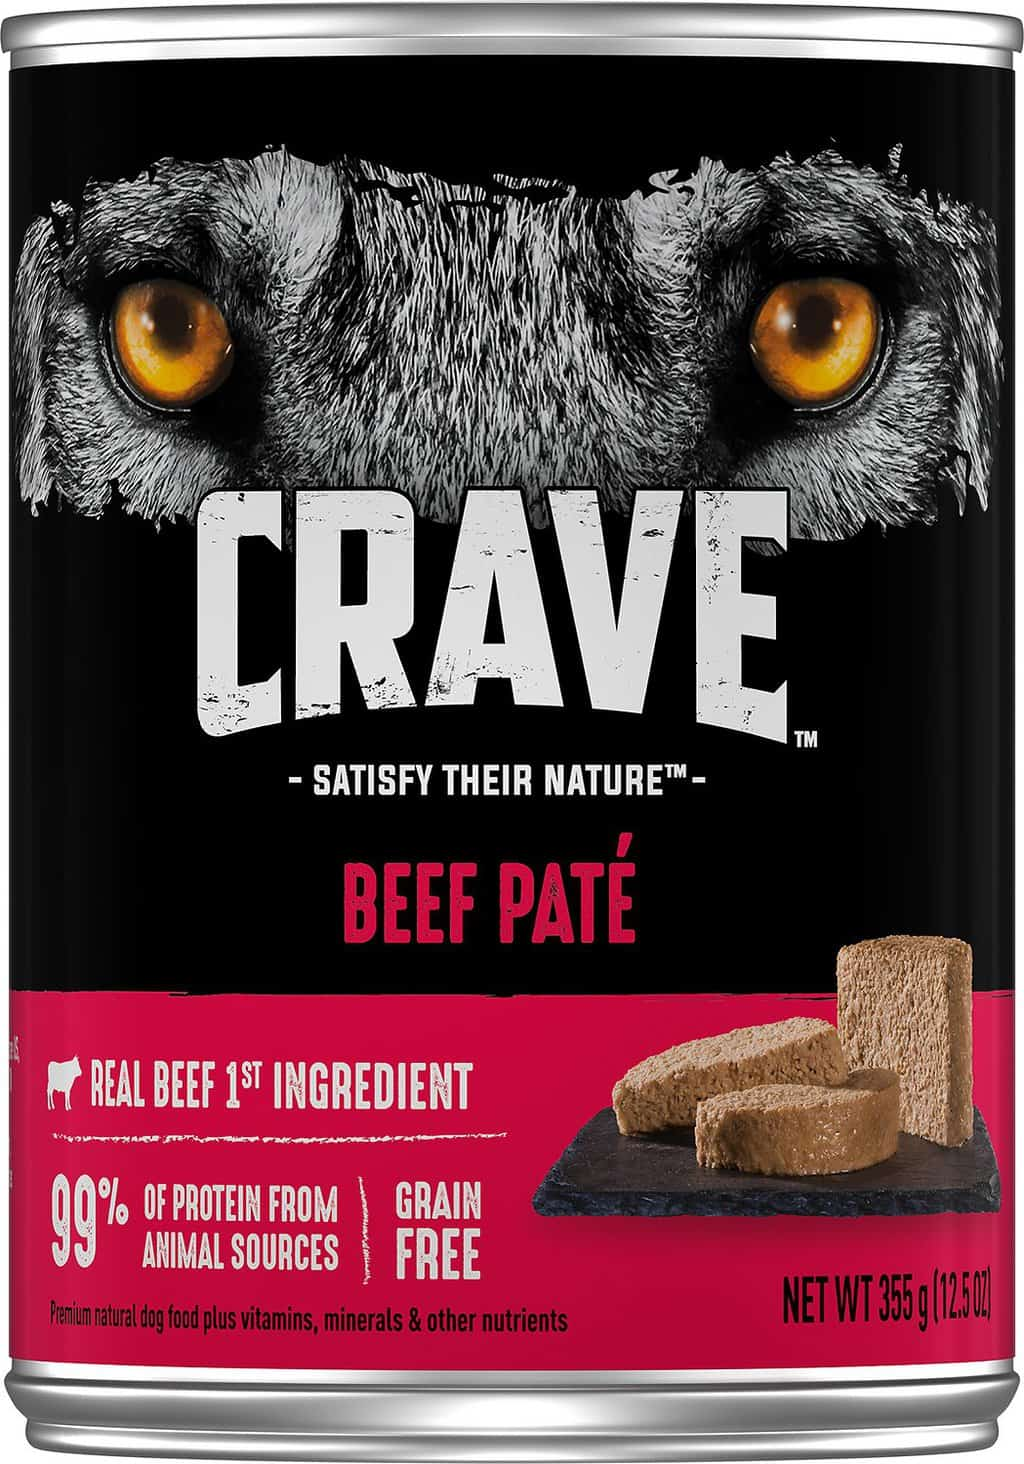 Crave Dog Food Review 2021: Best Canine Ancestral Diet? 14